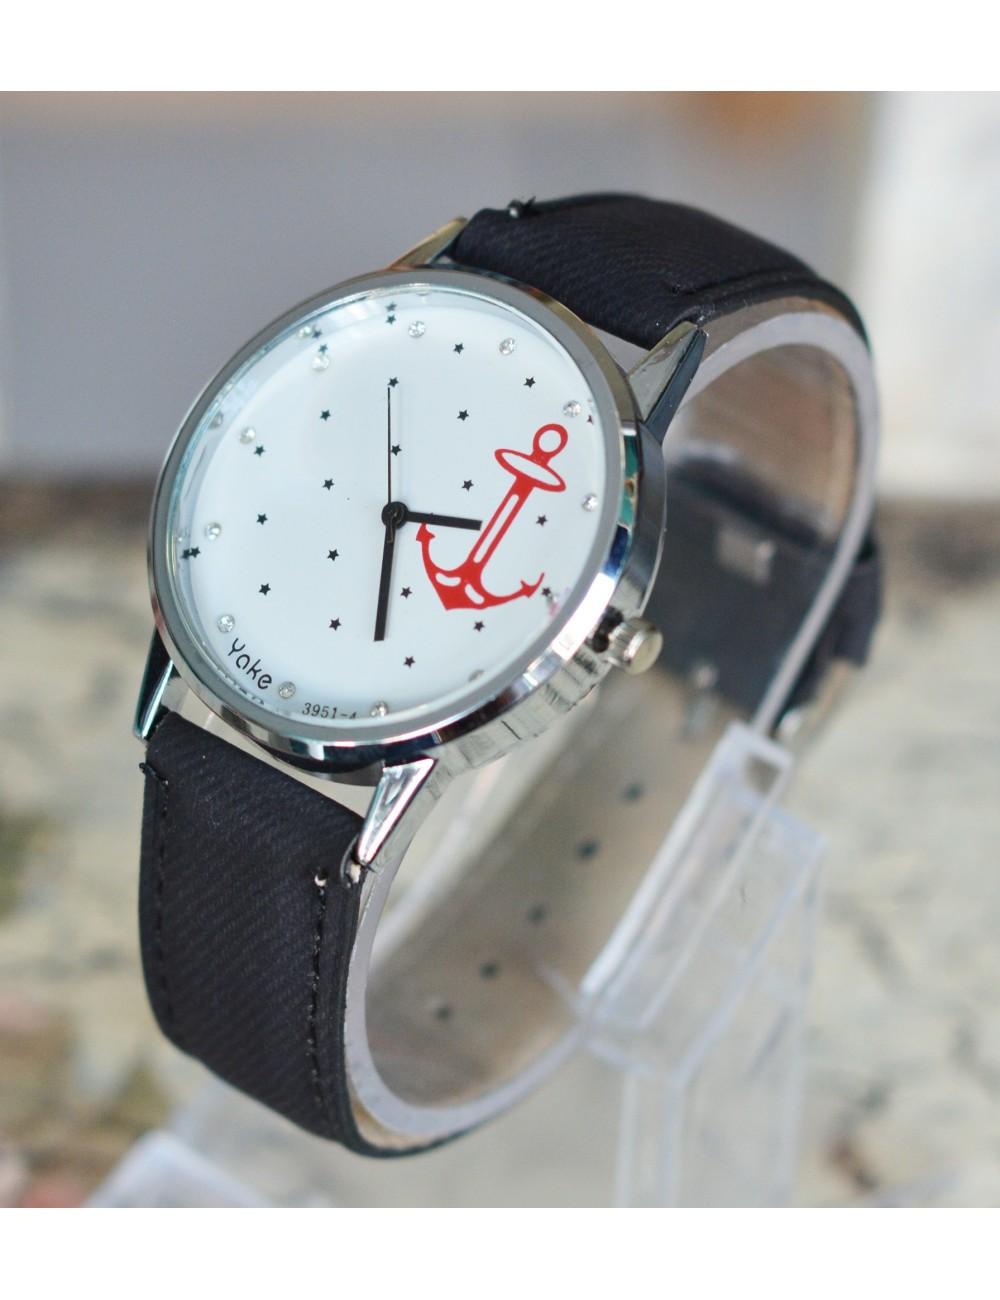 Reloj de Ancla con estrellas